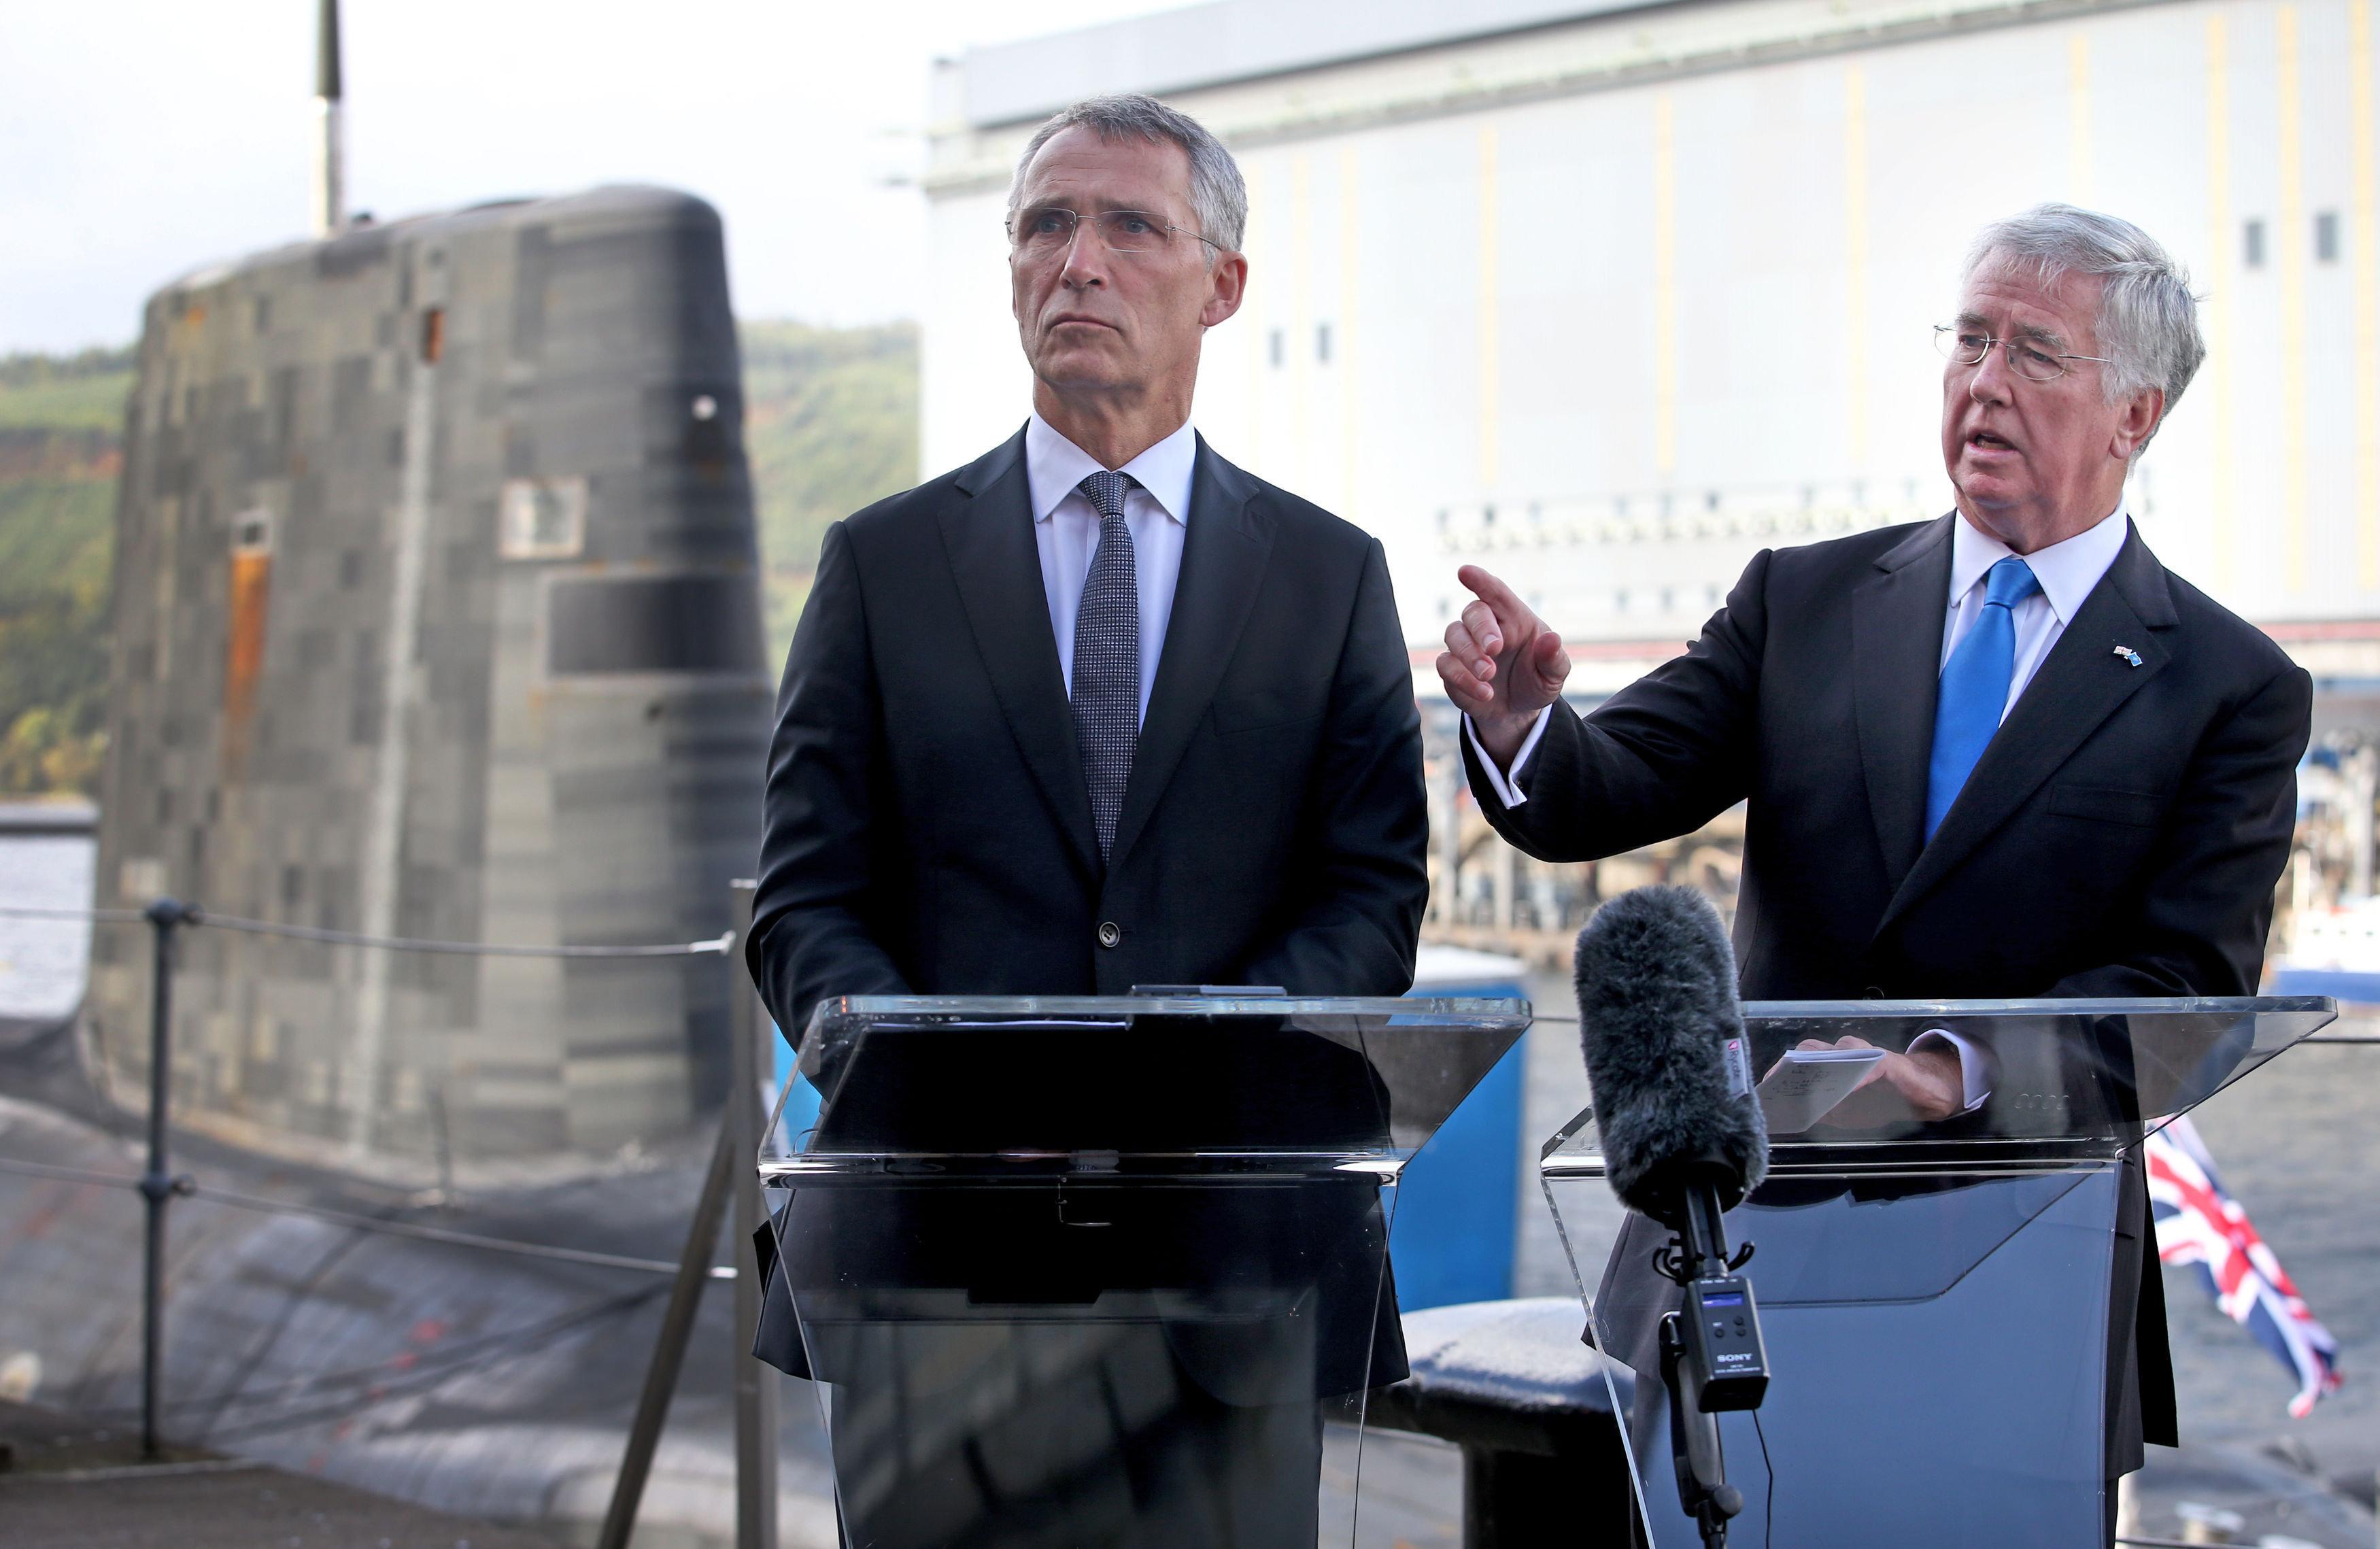 Defence Secretary Sir Michael Fallon and Nato Secretary General Jens Stollenberg speak to the media alongside...